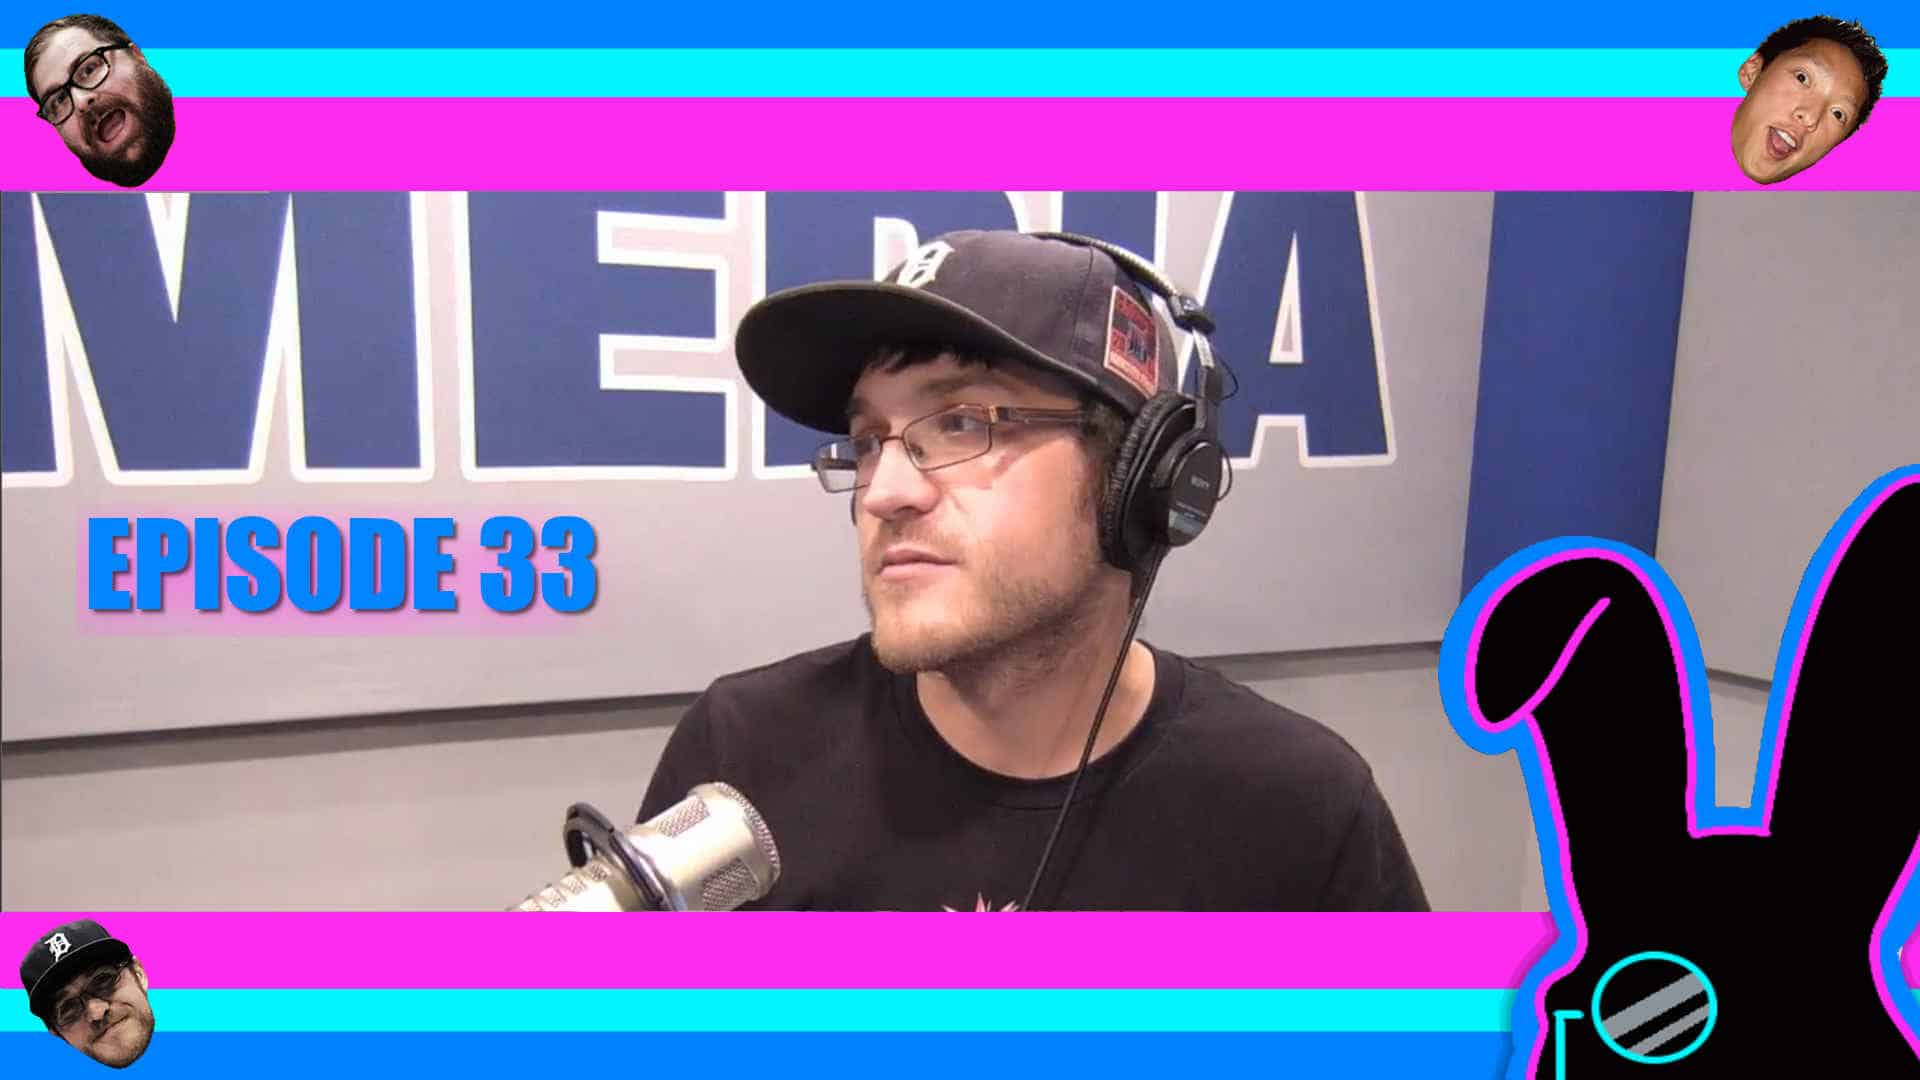 Geektainment Weekly - Episode 33